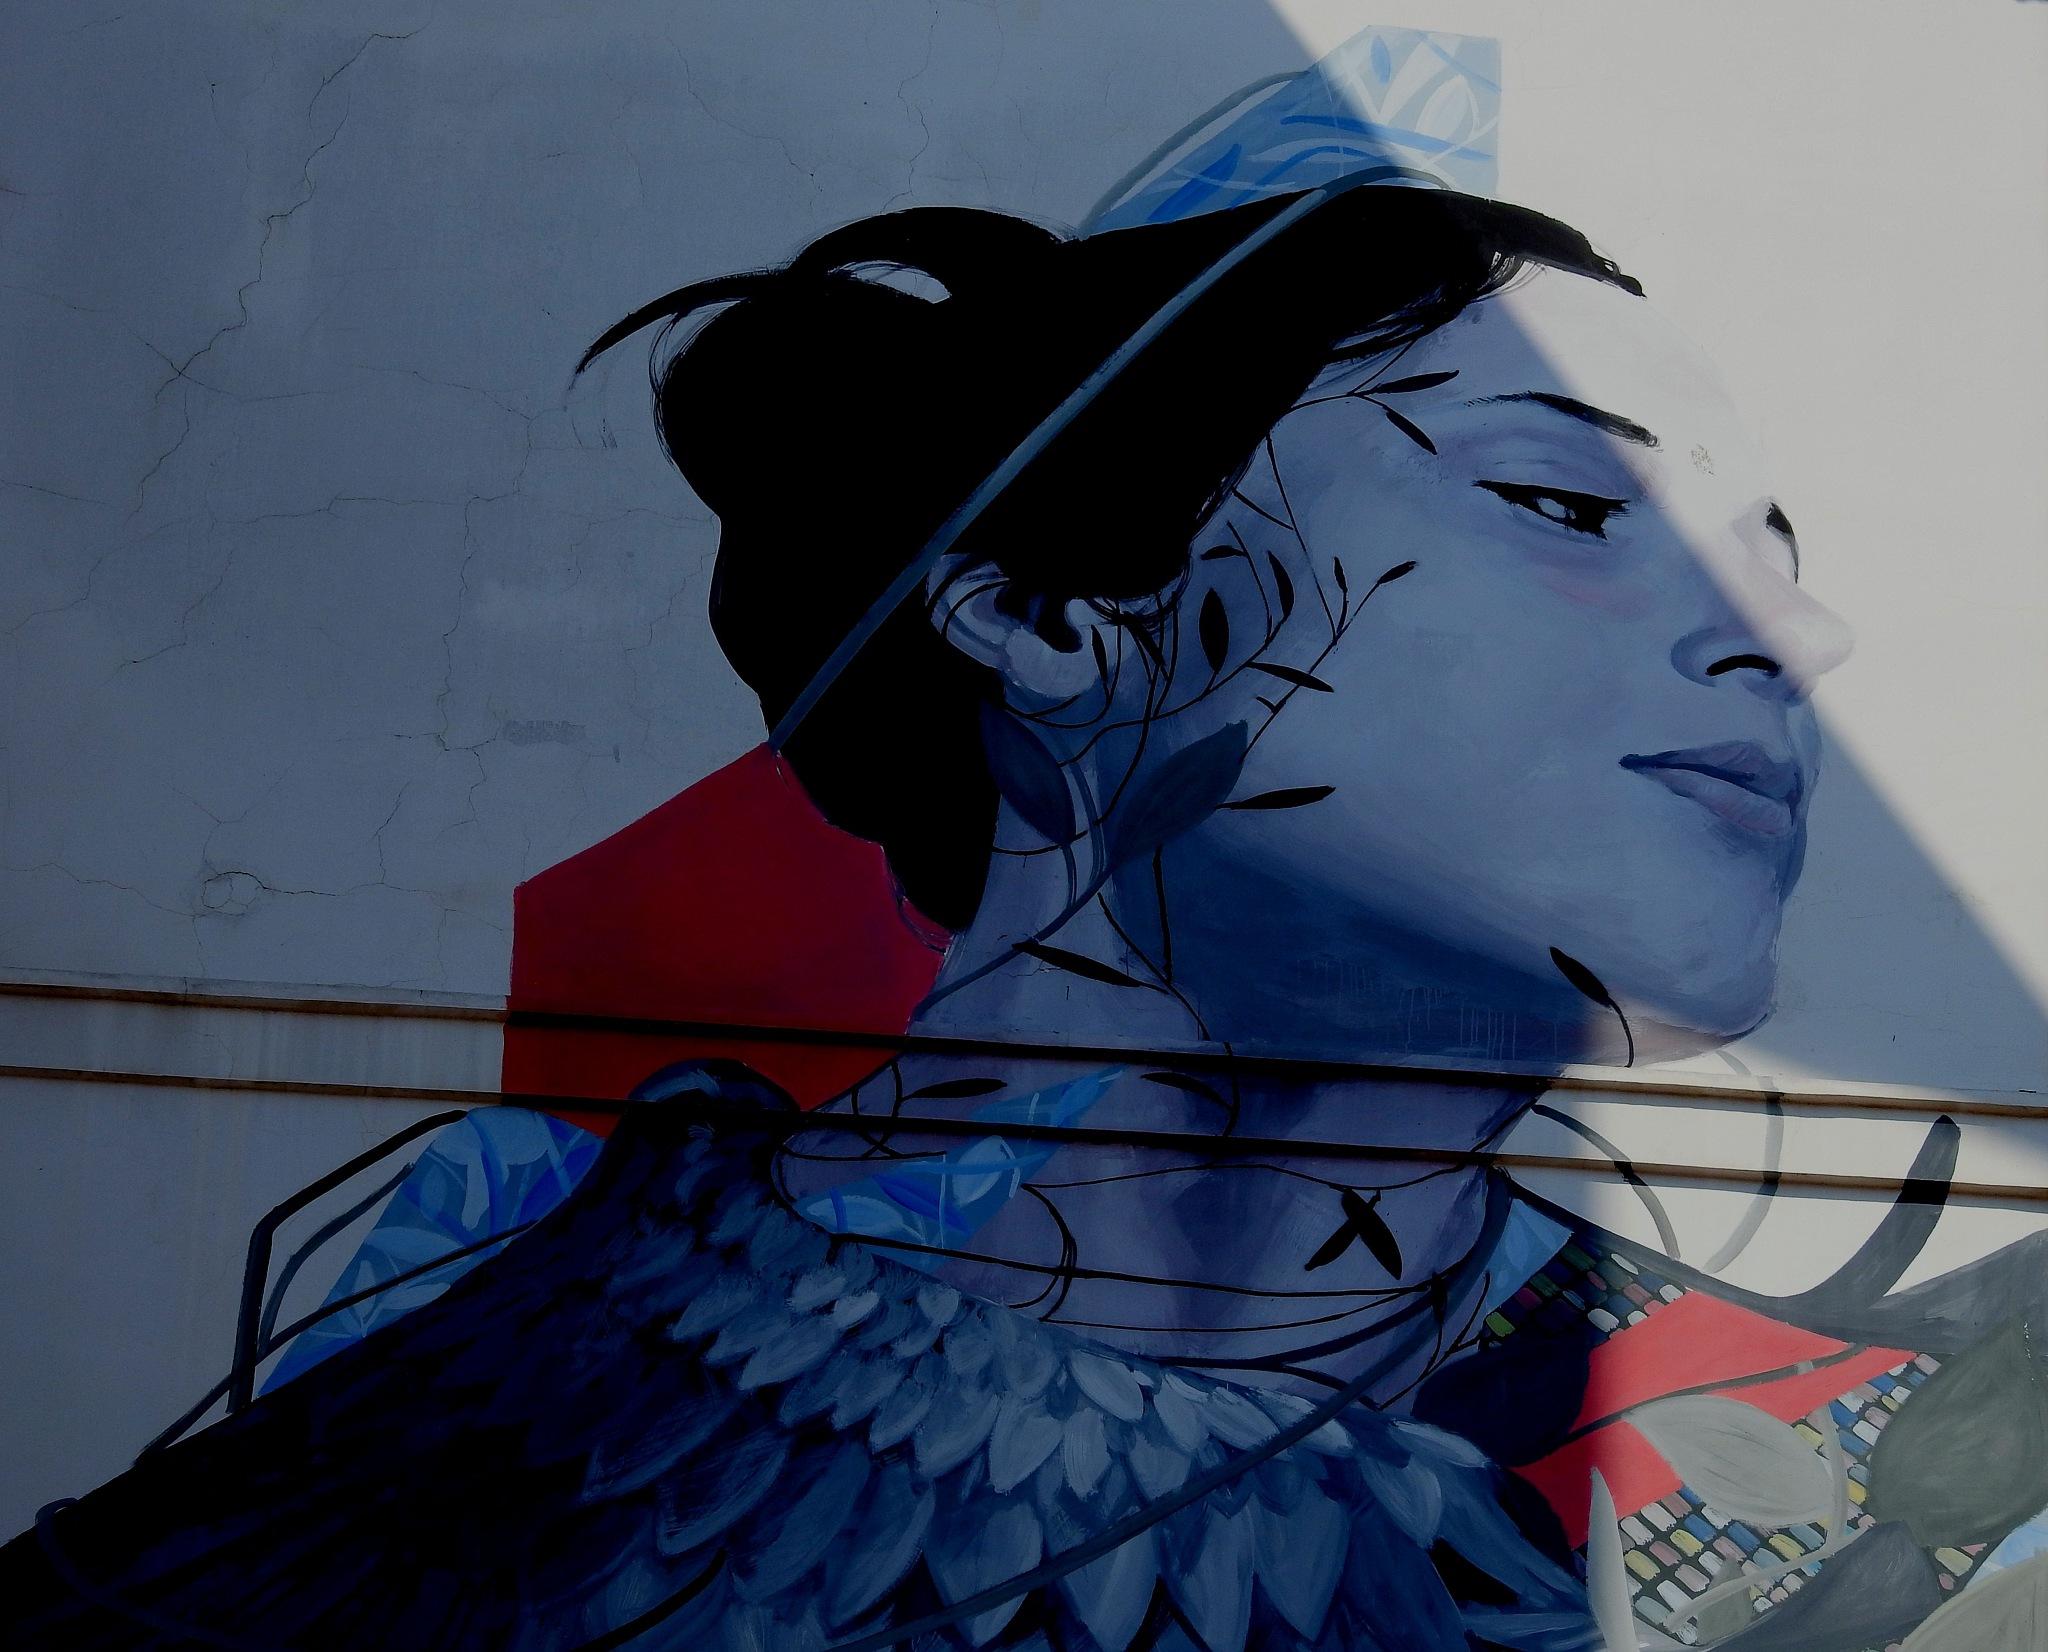 Naples Materdei -  Street Art - Partenope of Francisco Bosoletti - 1 by Arnaldo De Lisio